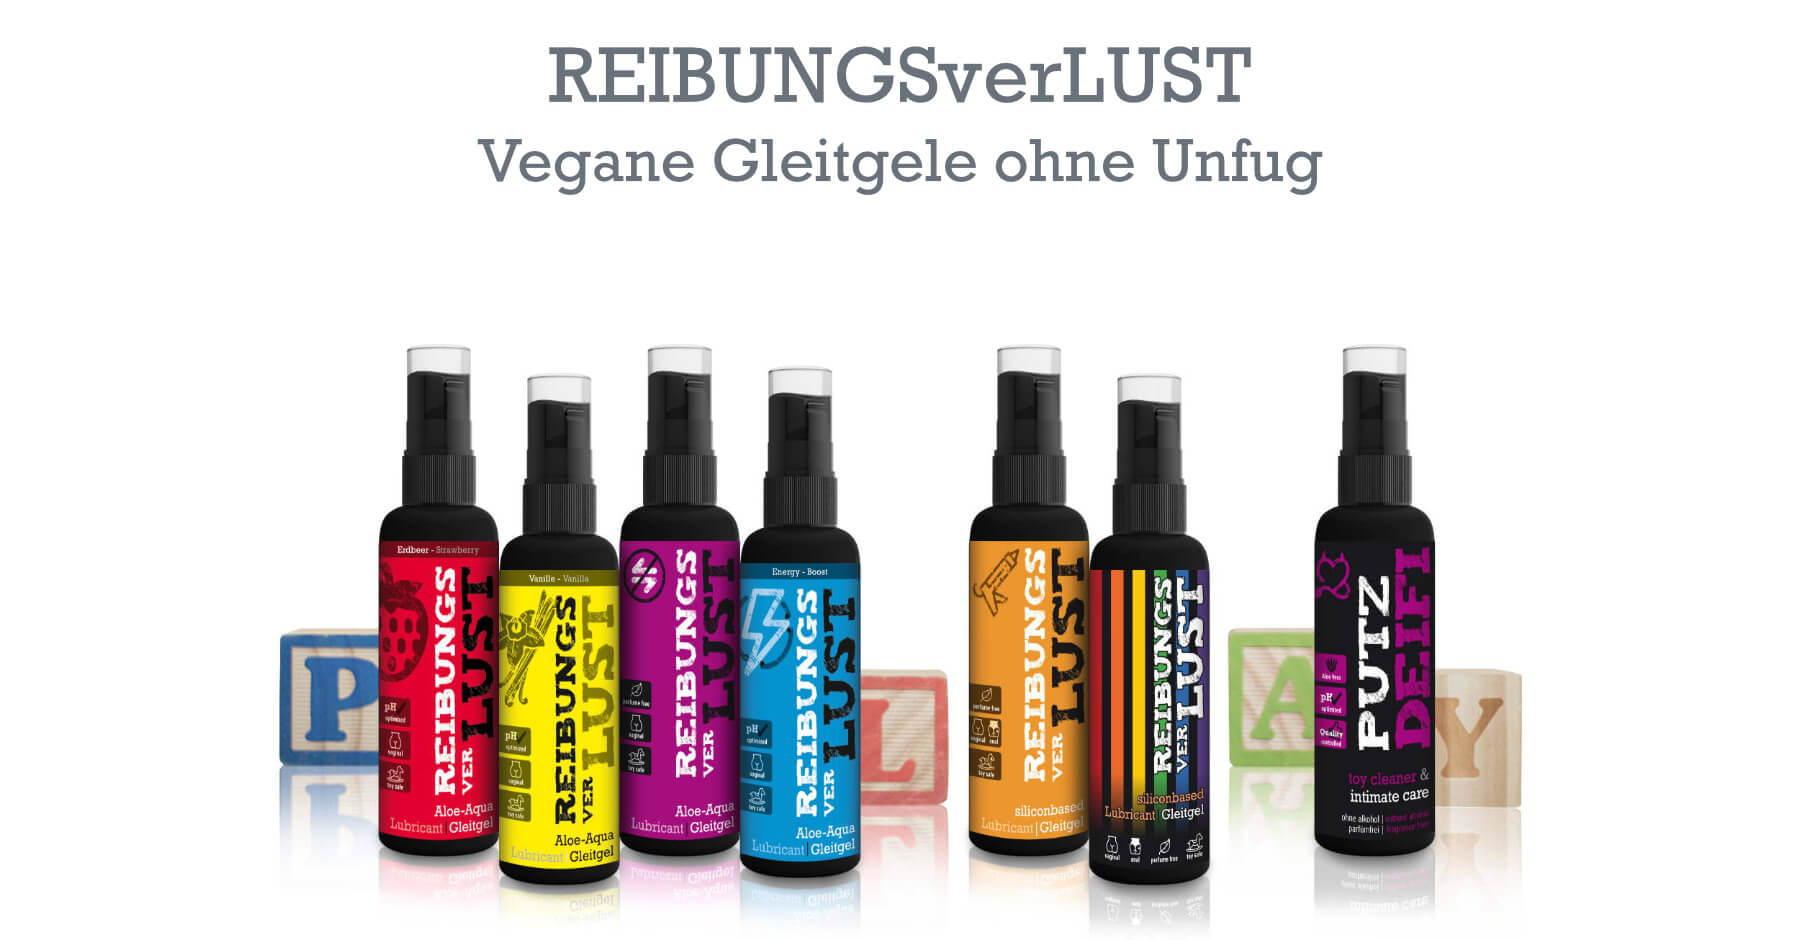 REIBUNGSverLUST - Vegane Gleitgele ohne Unfug